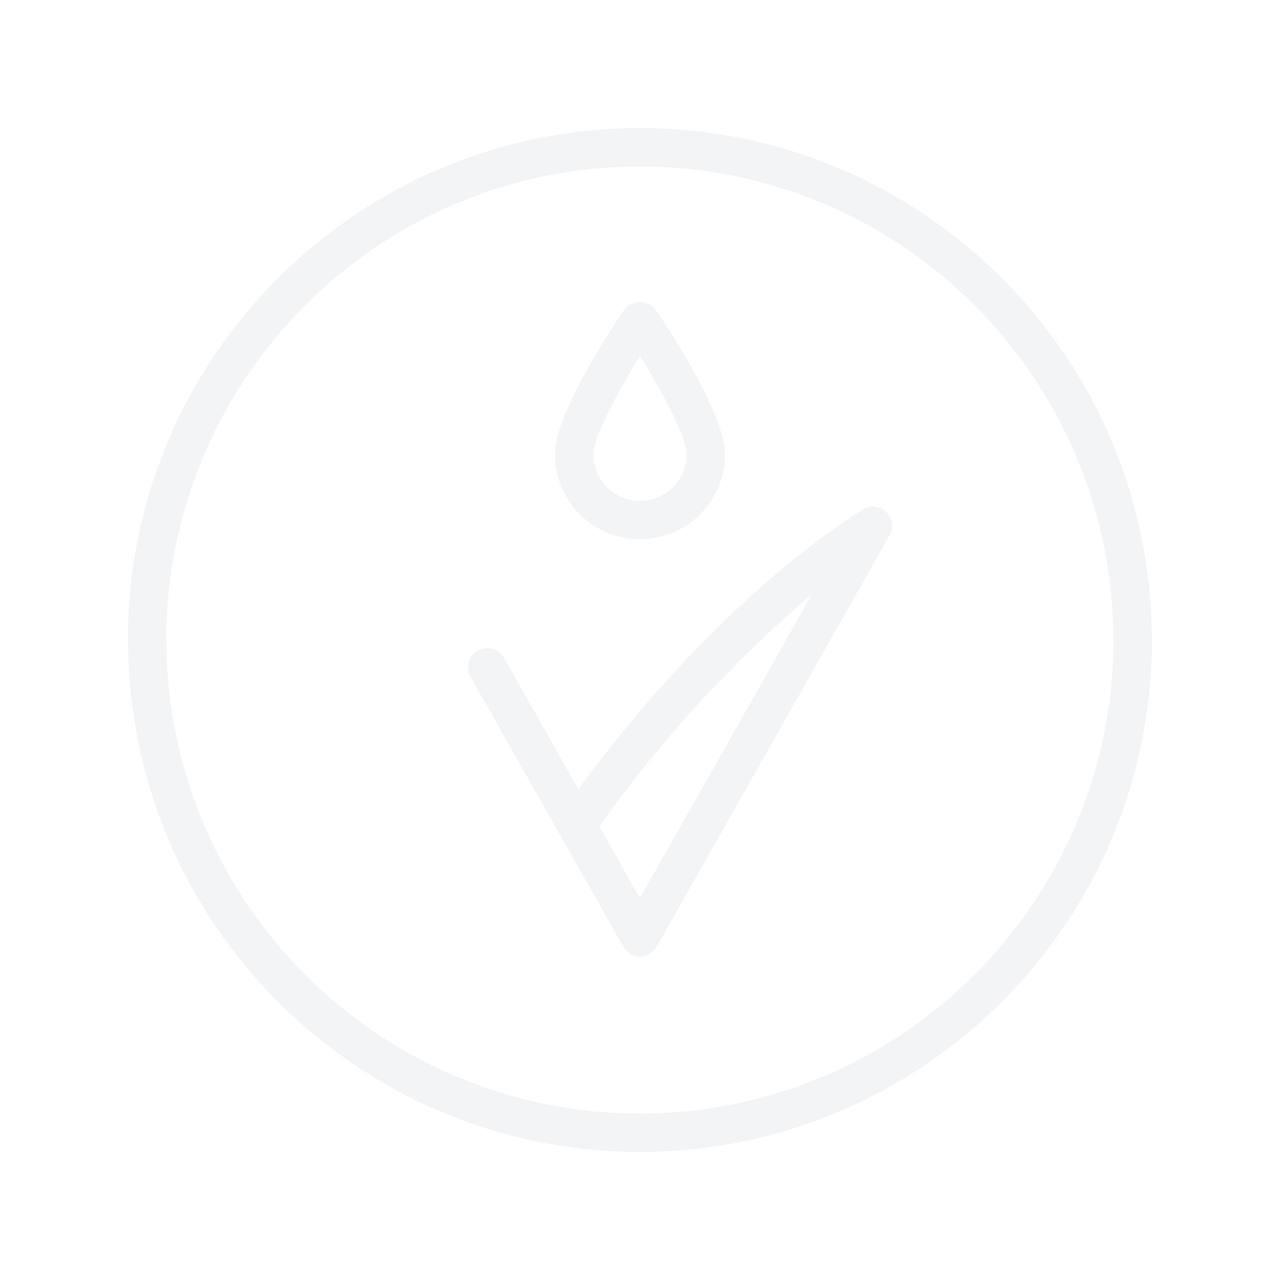 Bourjois 3D Effet Lip Gloss No 33 Brun Poetic 5.7ml